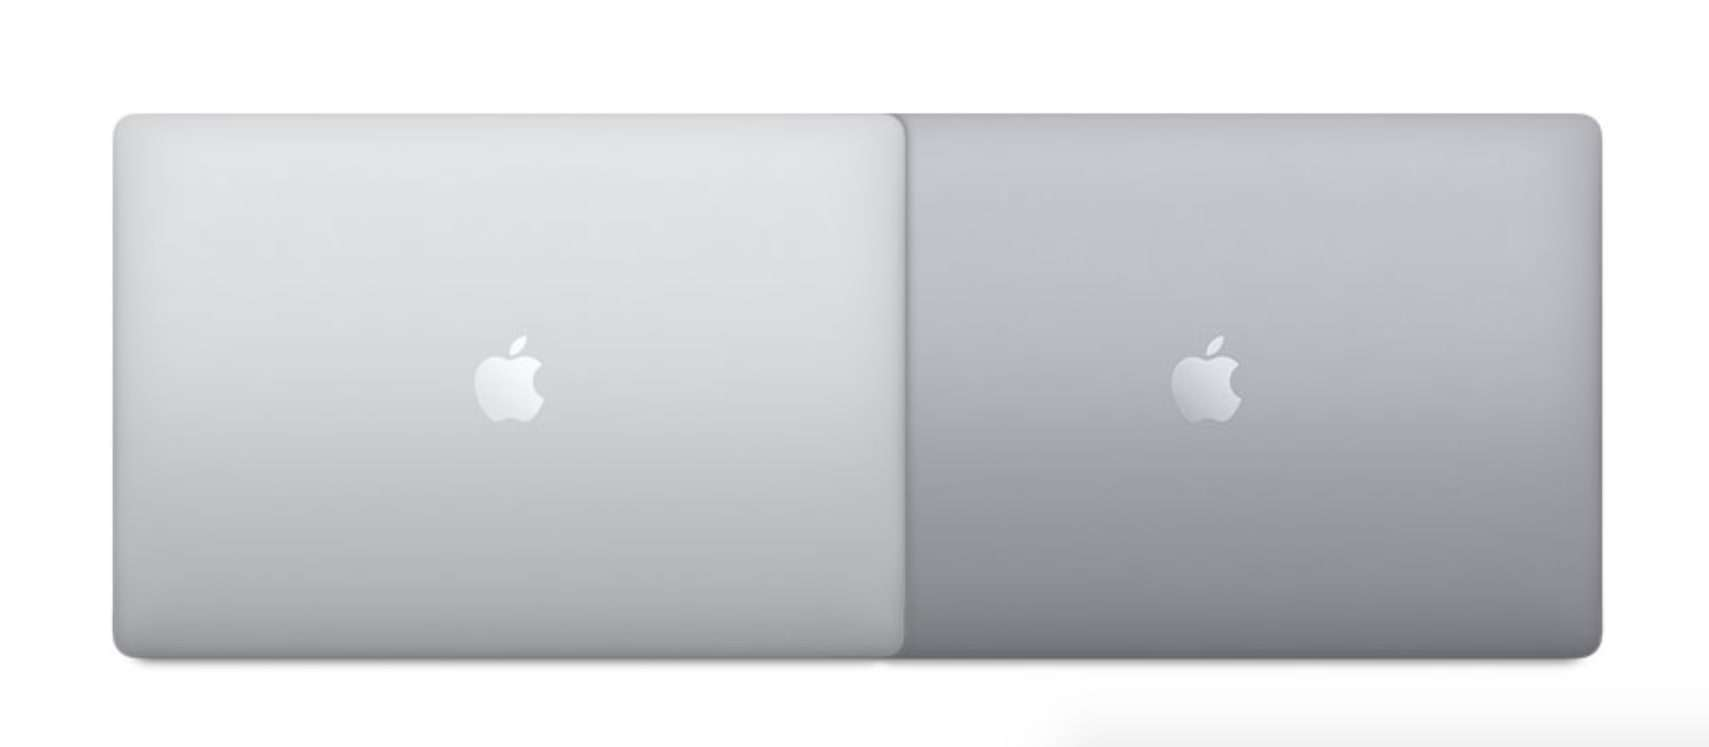 Laptopvang - 2 Màu MacBook Pro 16 inch